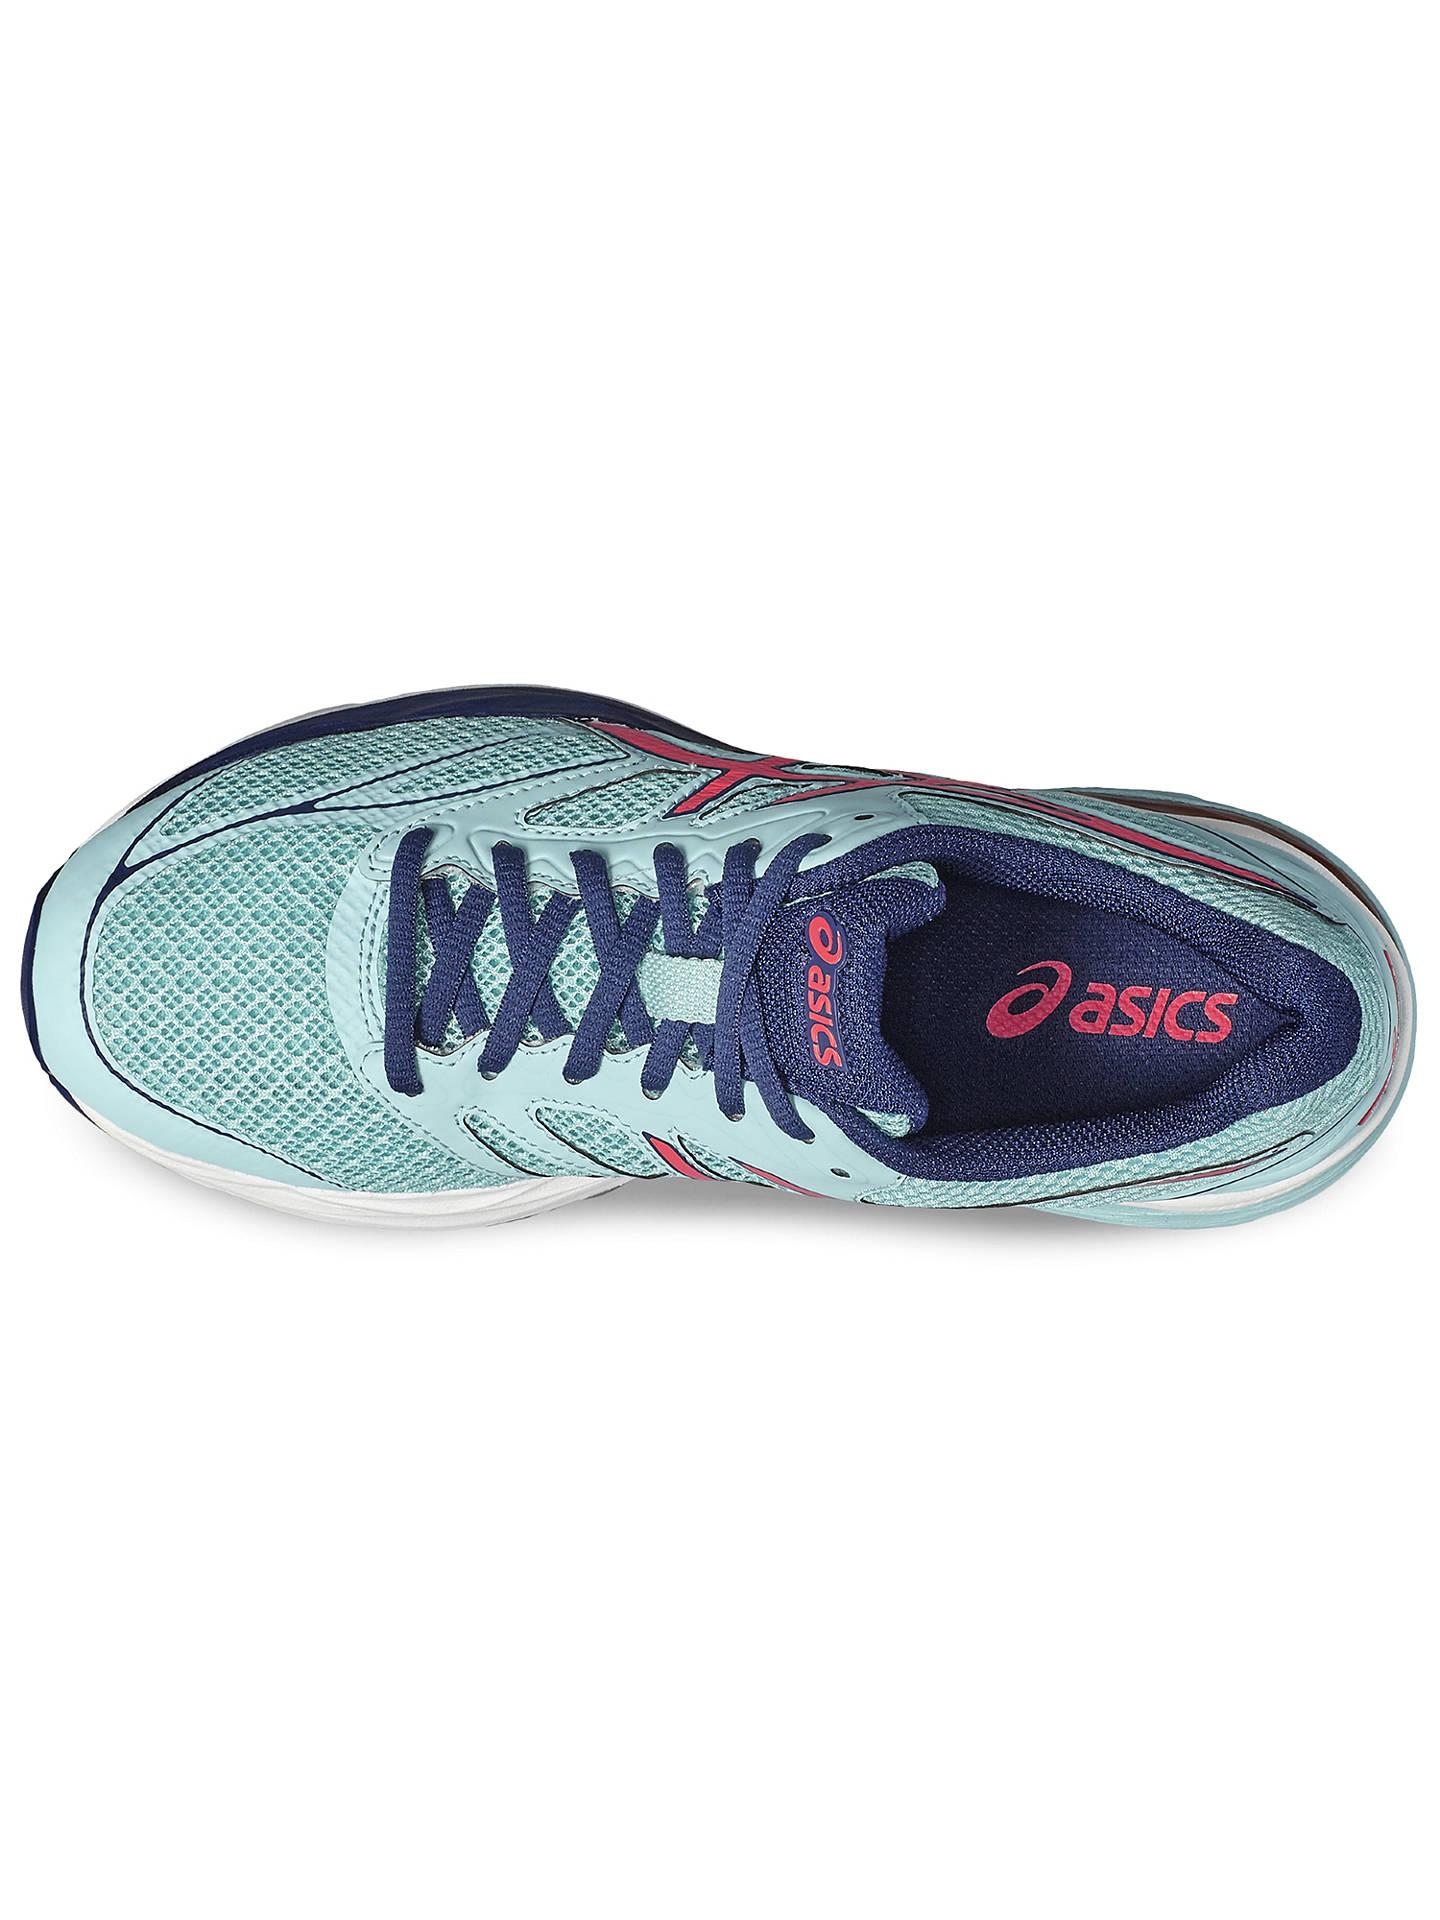 08bc570a Asics GEL-PULSE 8 Women's Running Shoes, Blue/Pink at John Lewis ...